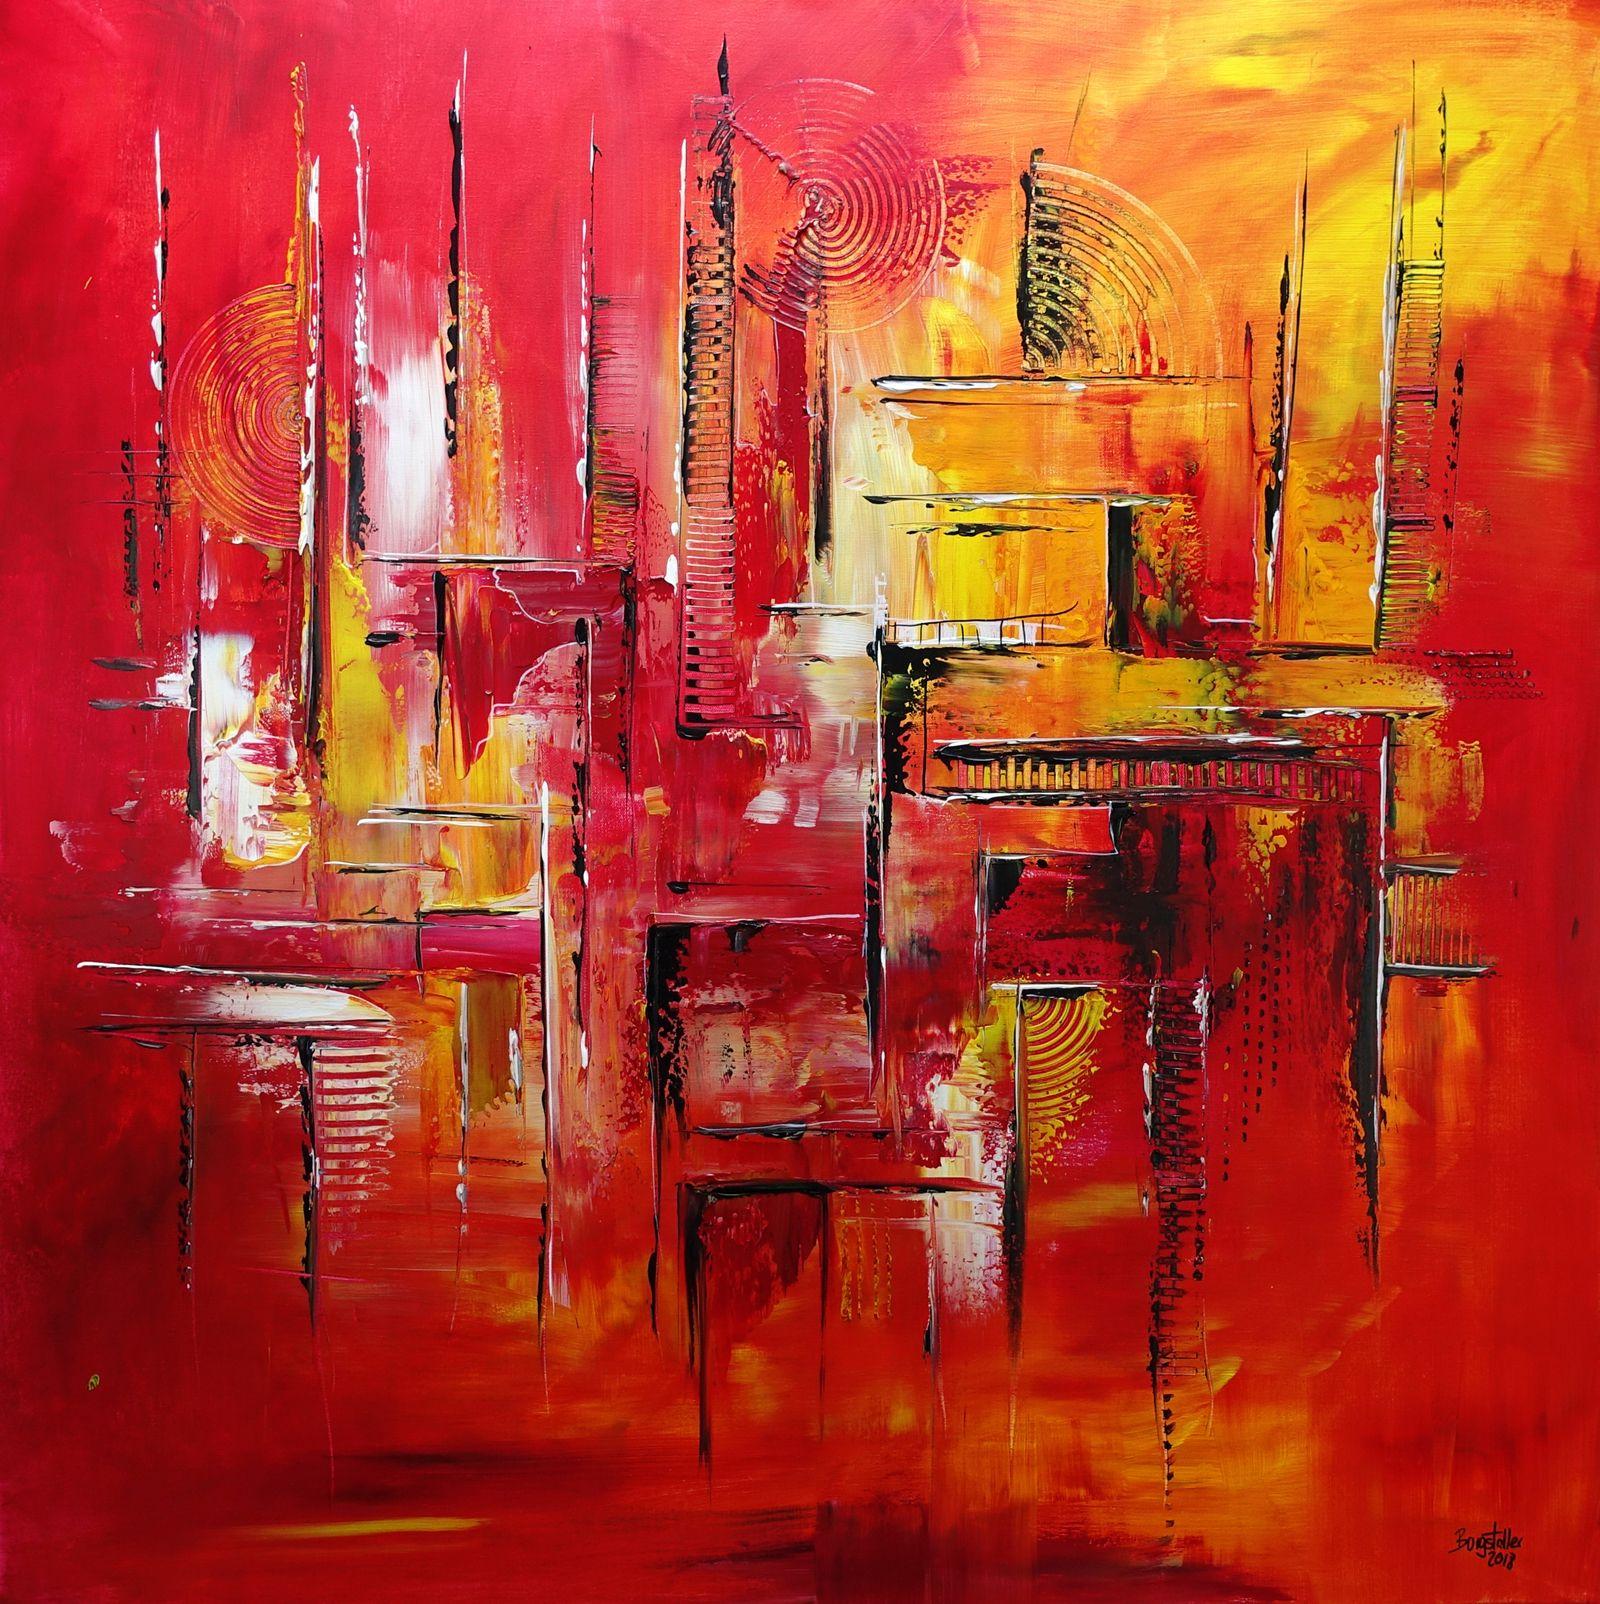 276 abstrakte gemalde verkauft feuerlabyrinth rot gelb wandbilder original kun abstraktes malerei acrylmalerei abstrakt moderne ölbilder auf leinwand acrylbilder